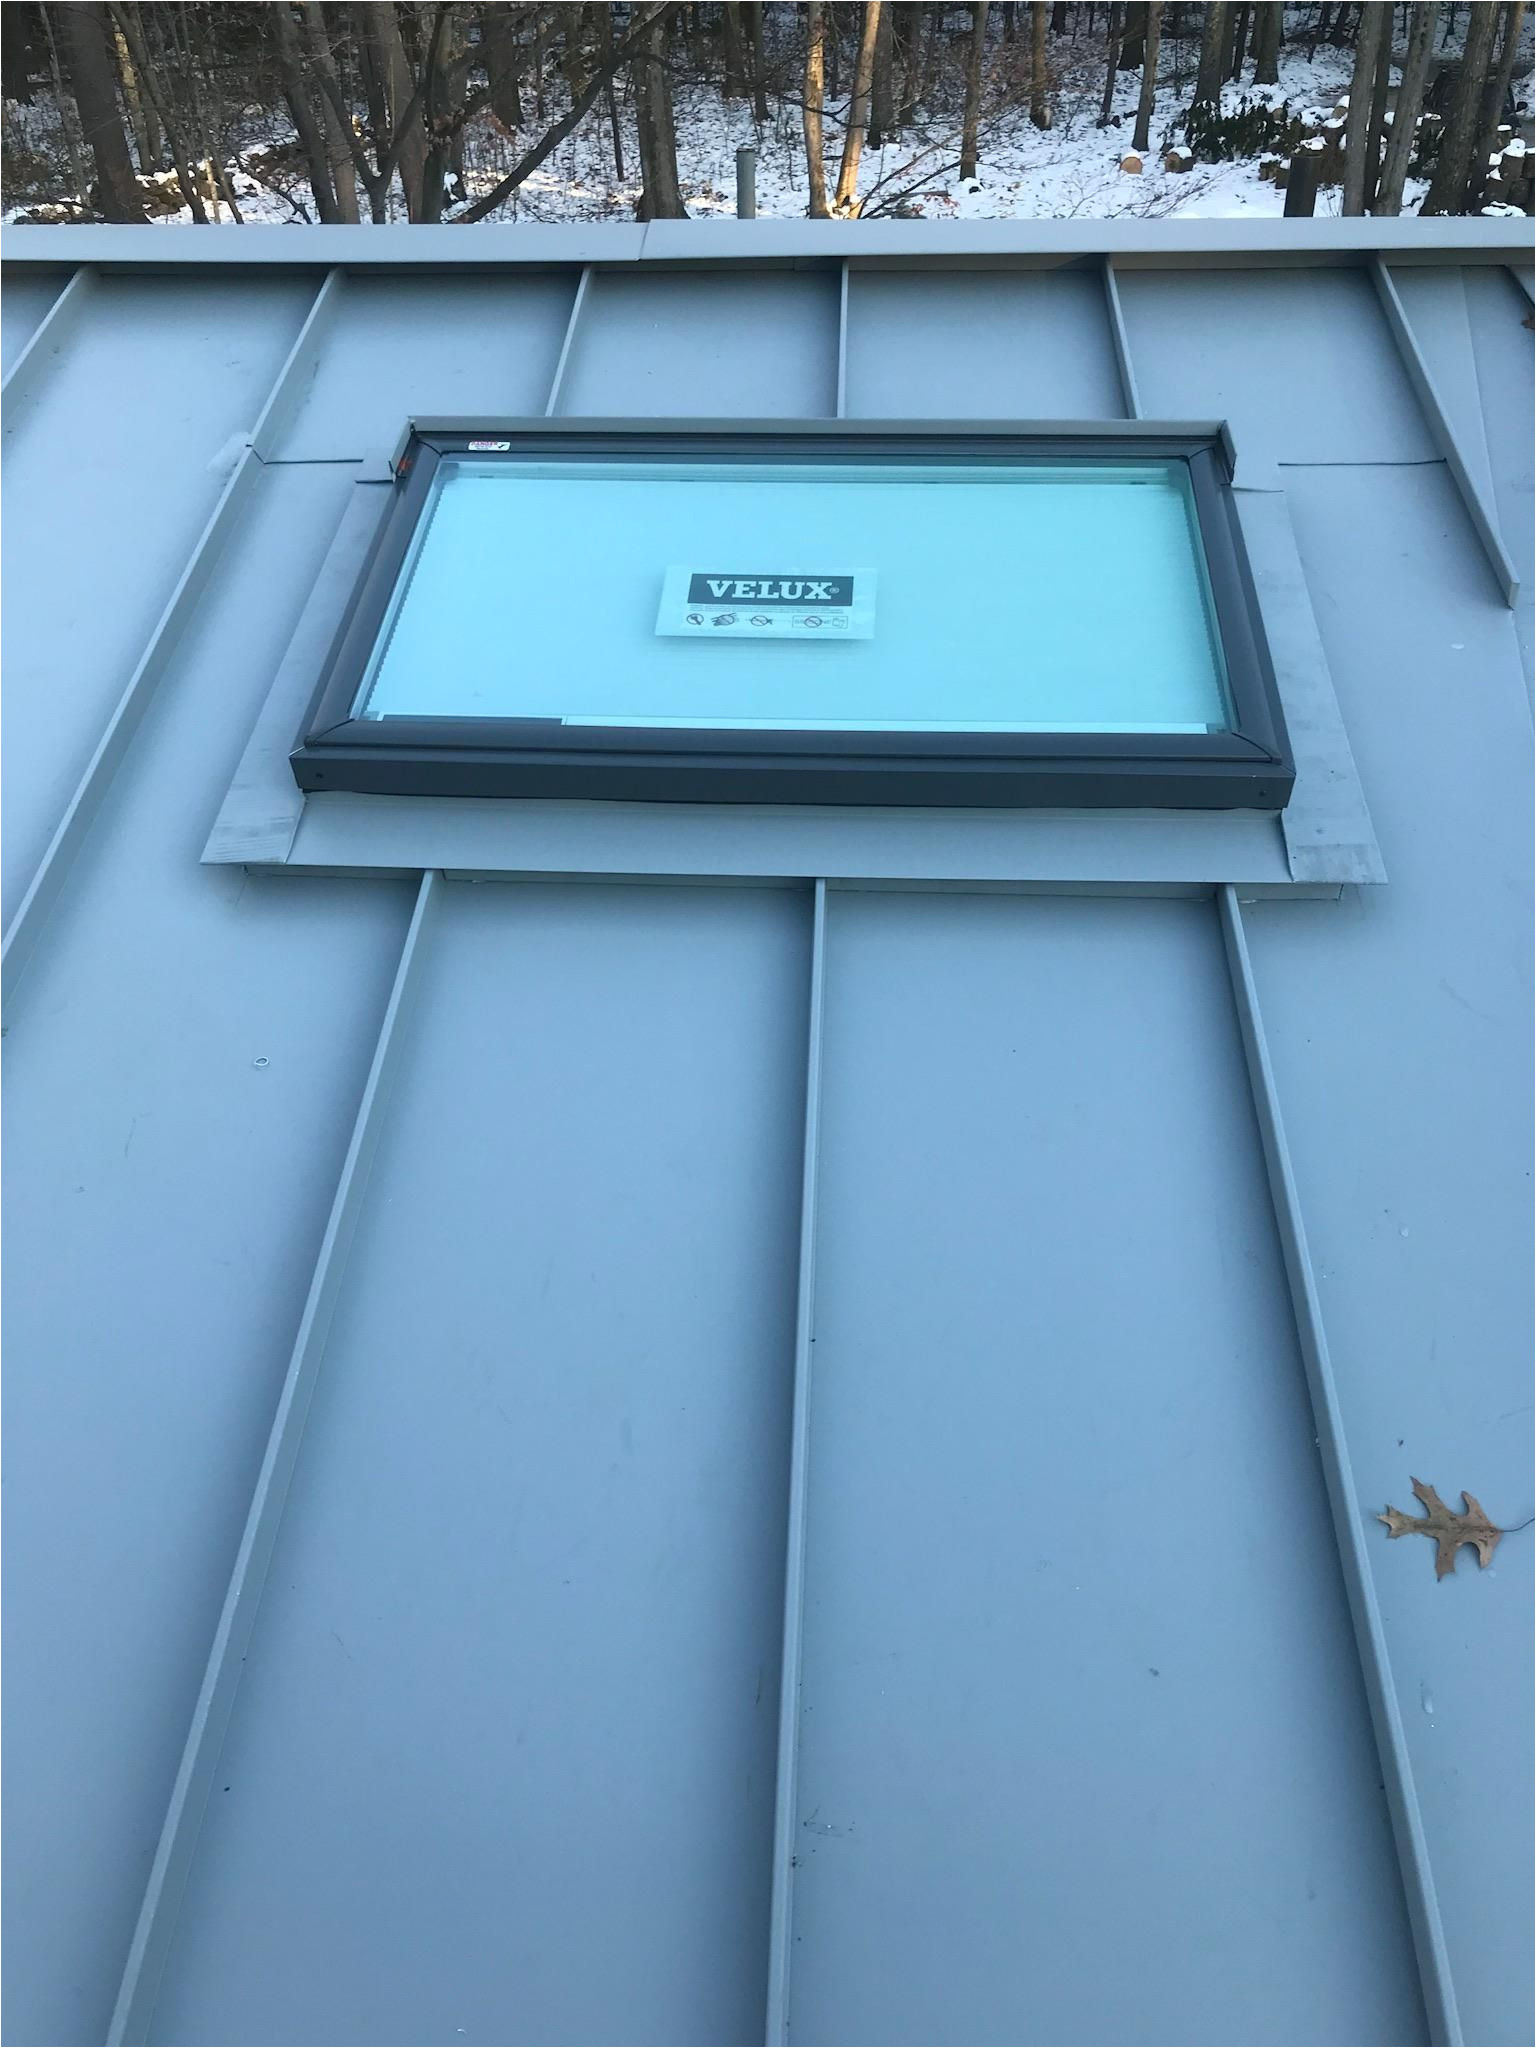 Velux Rigid Sun Tunnel Installation Instructions Standing Seam Standing Seam Metal Roofs Metal Roof Skylight